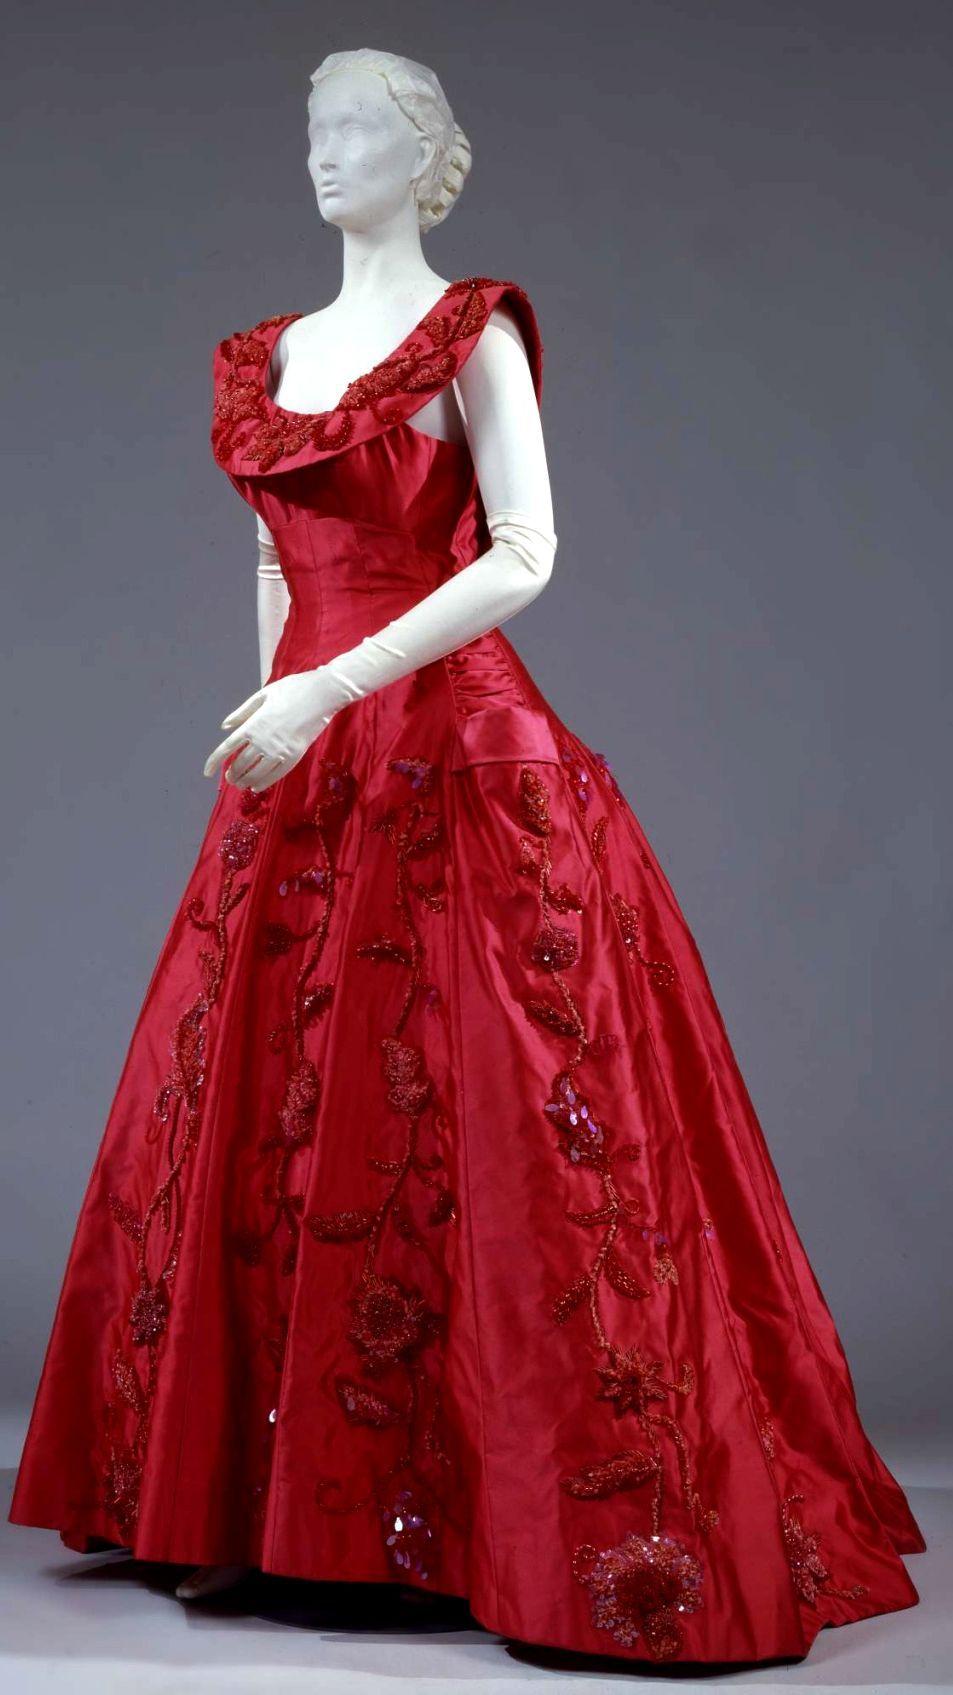 Us historical us us great fashion pinterest best